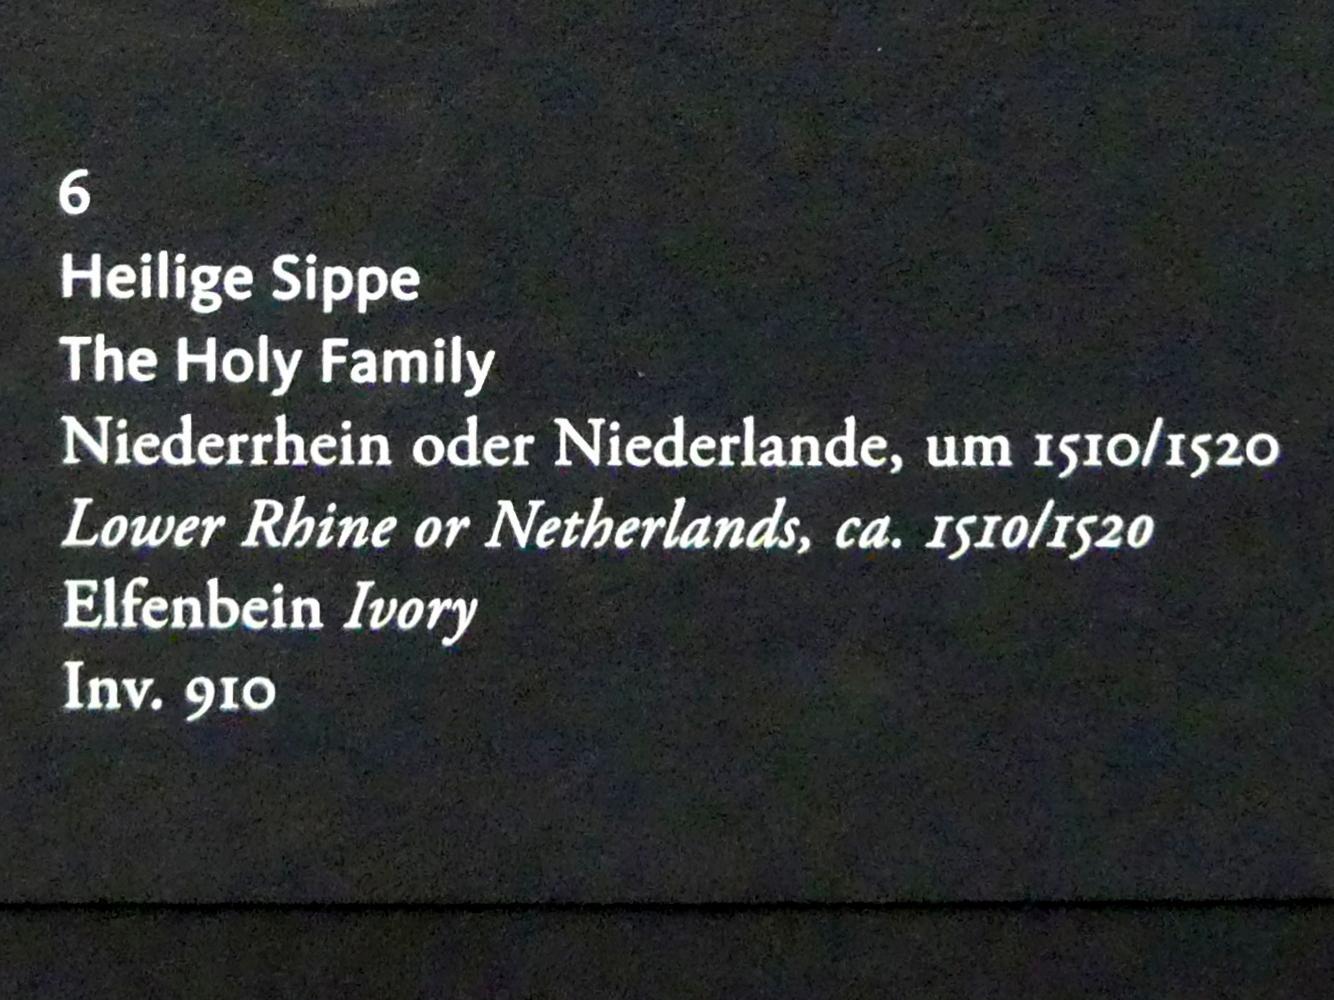 Heilige Sippe, Um 1510 - 1520